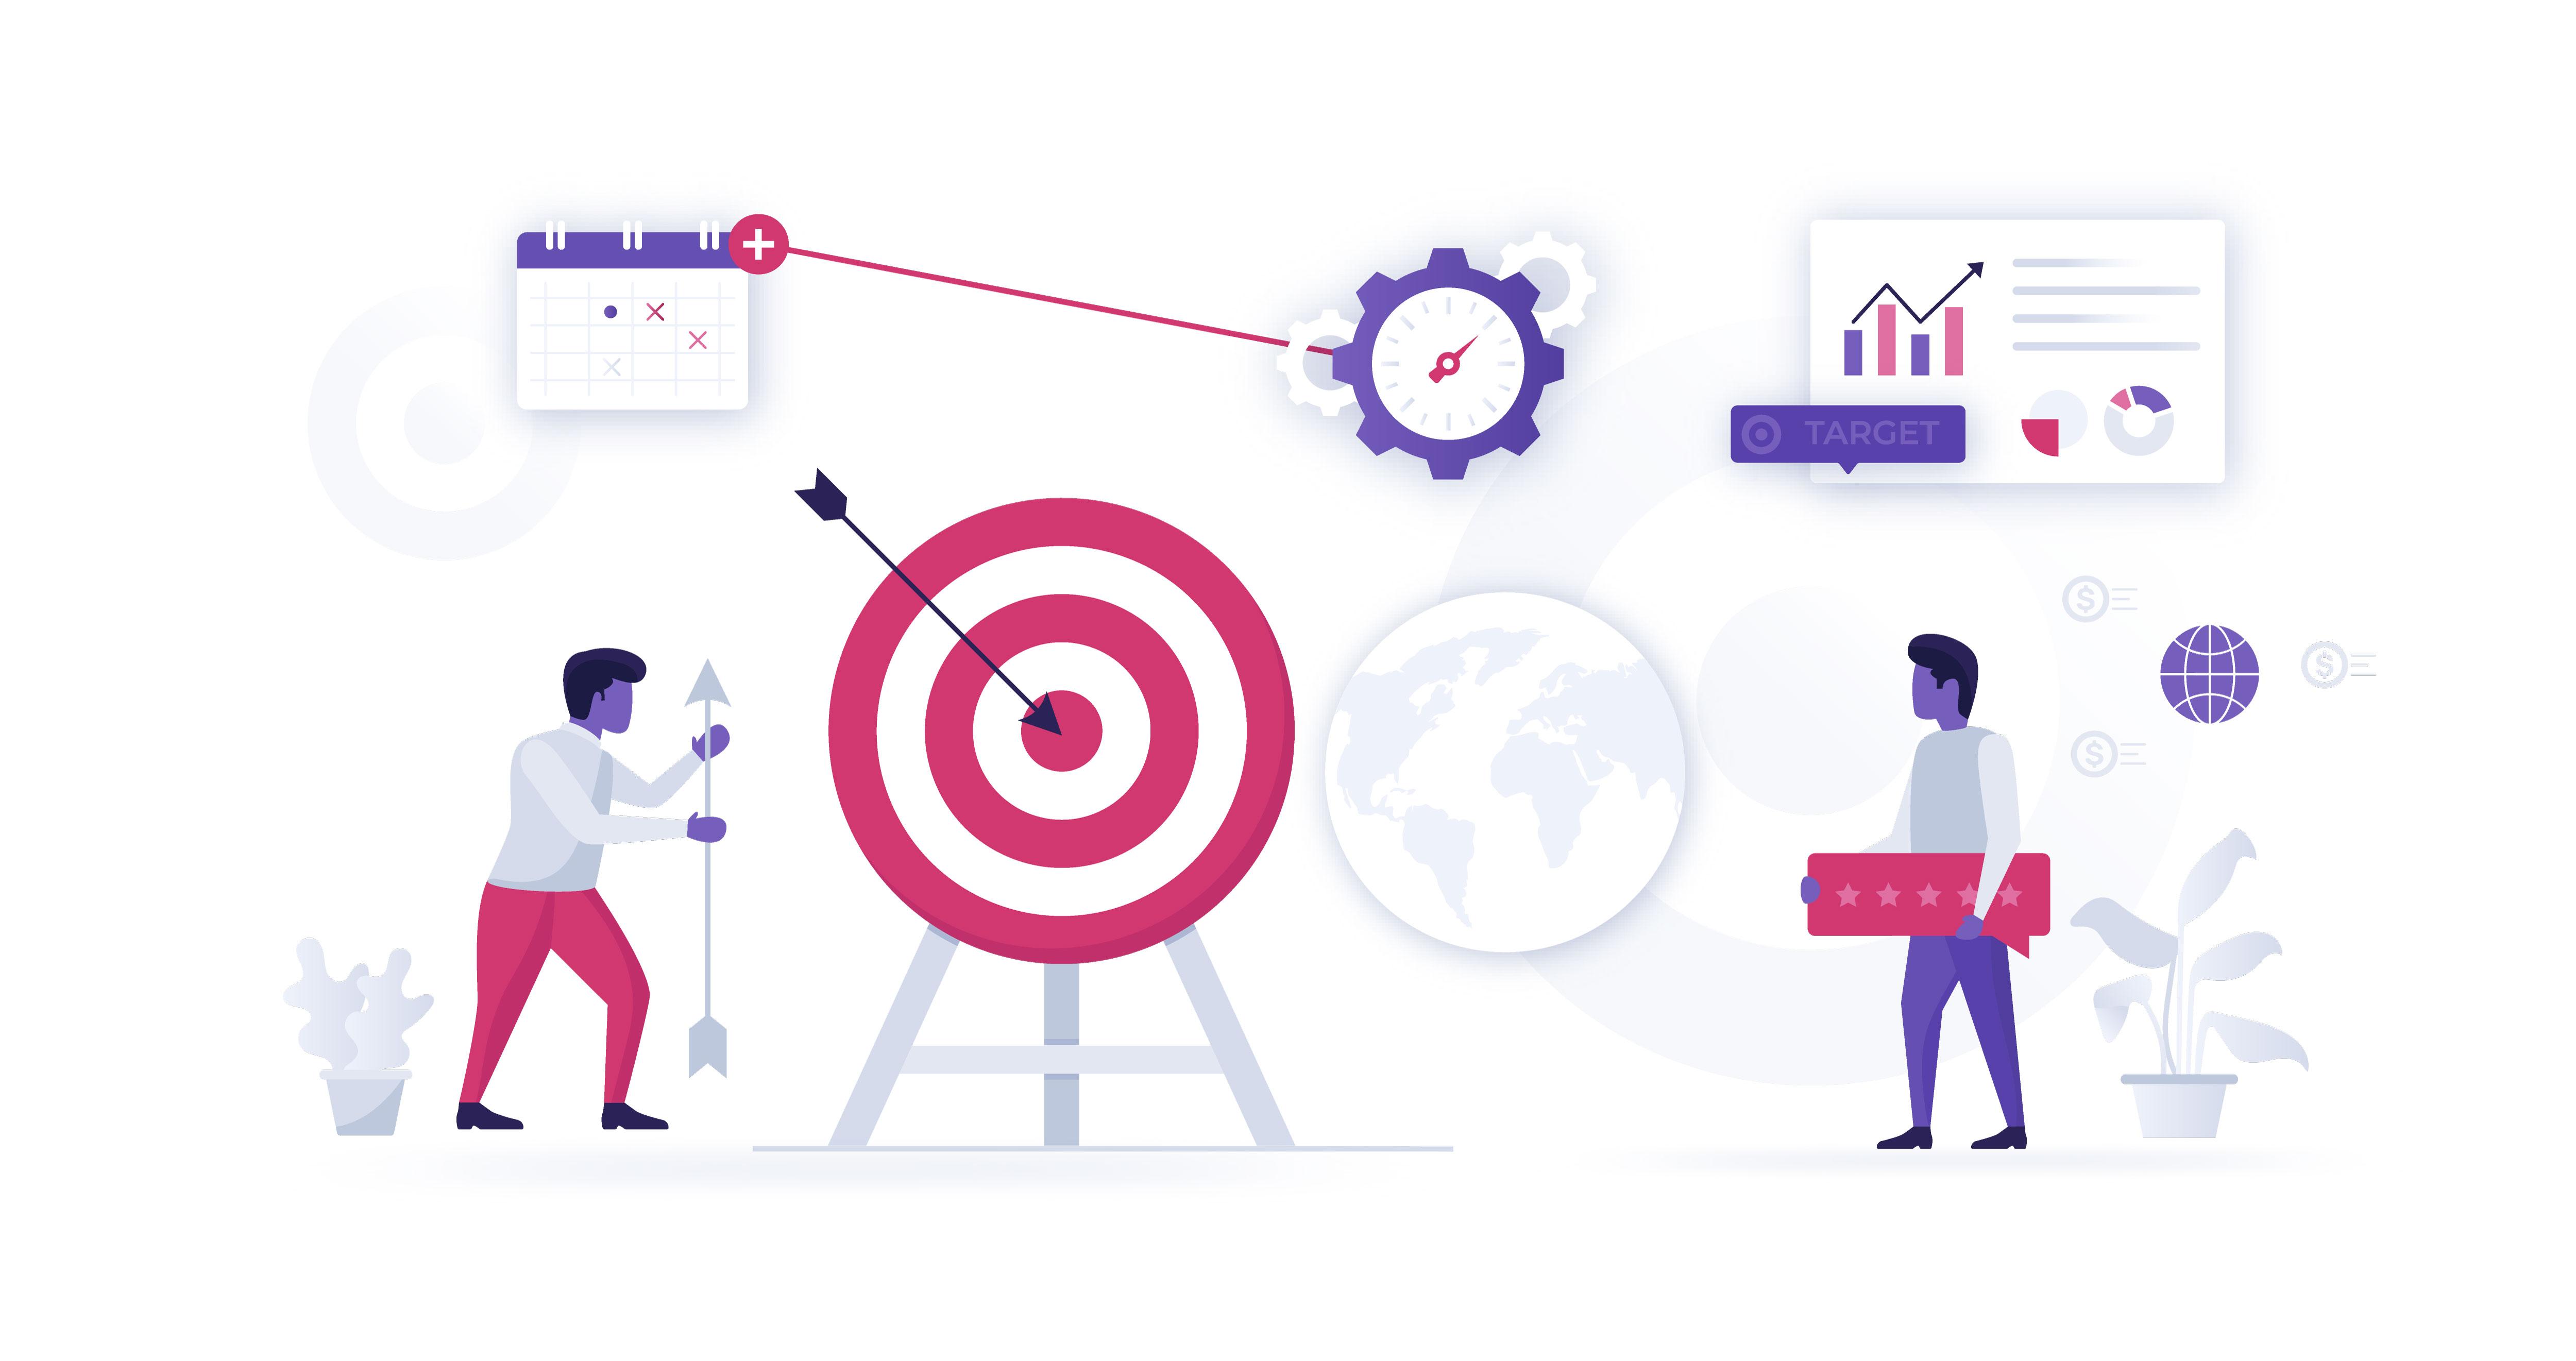 Business Target Vector Illustration